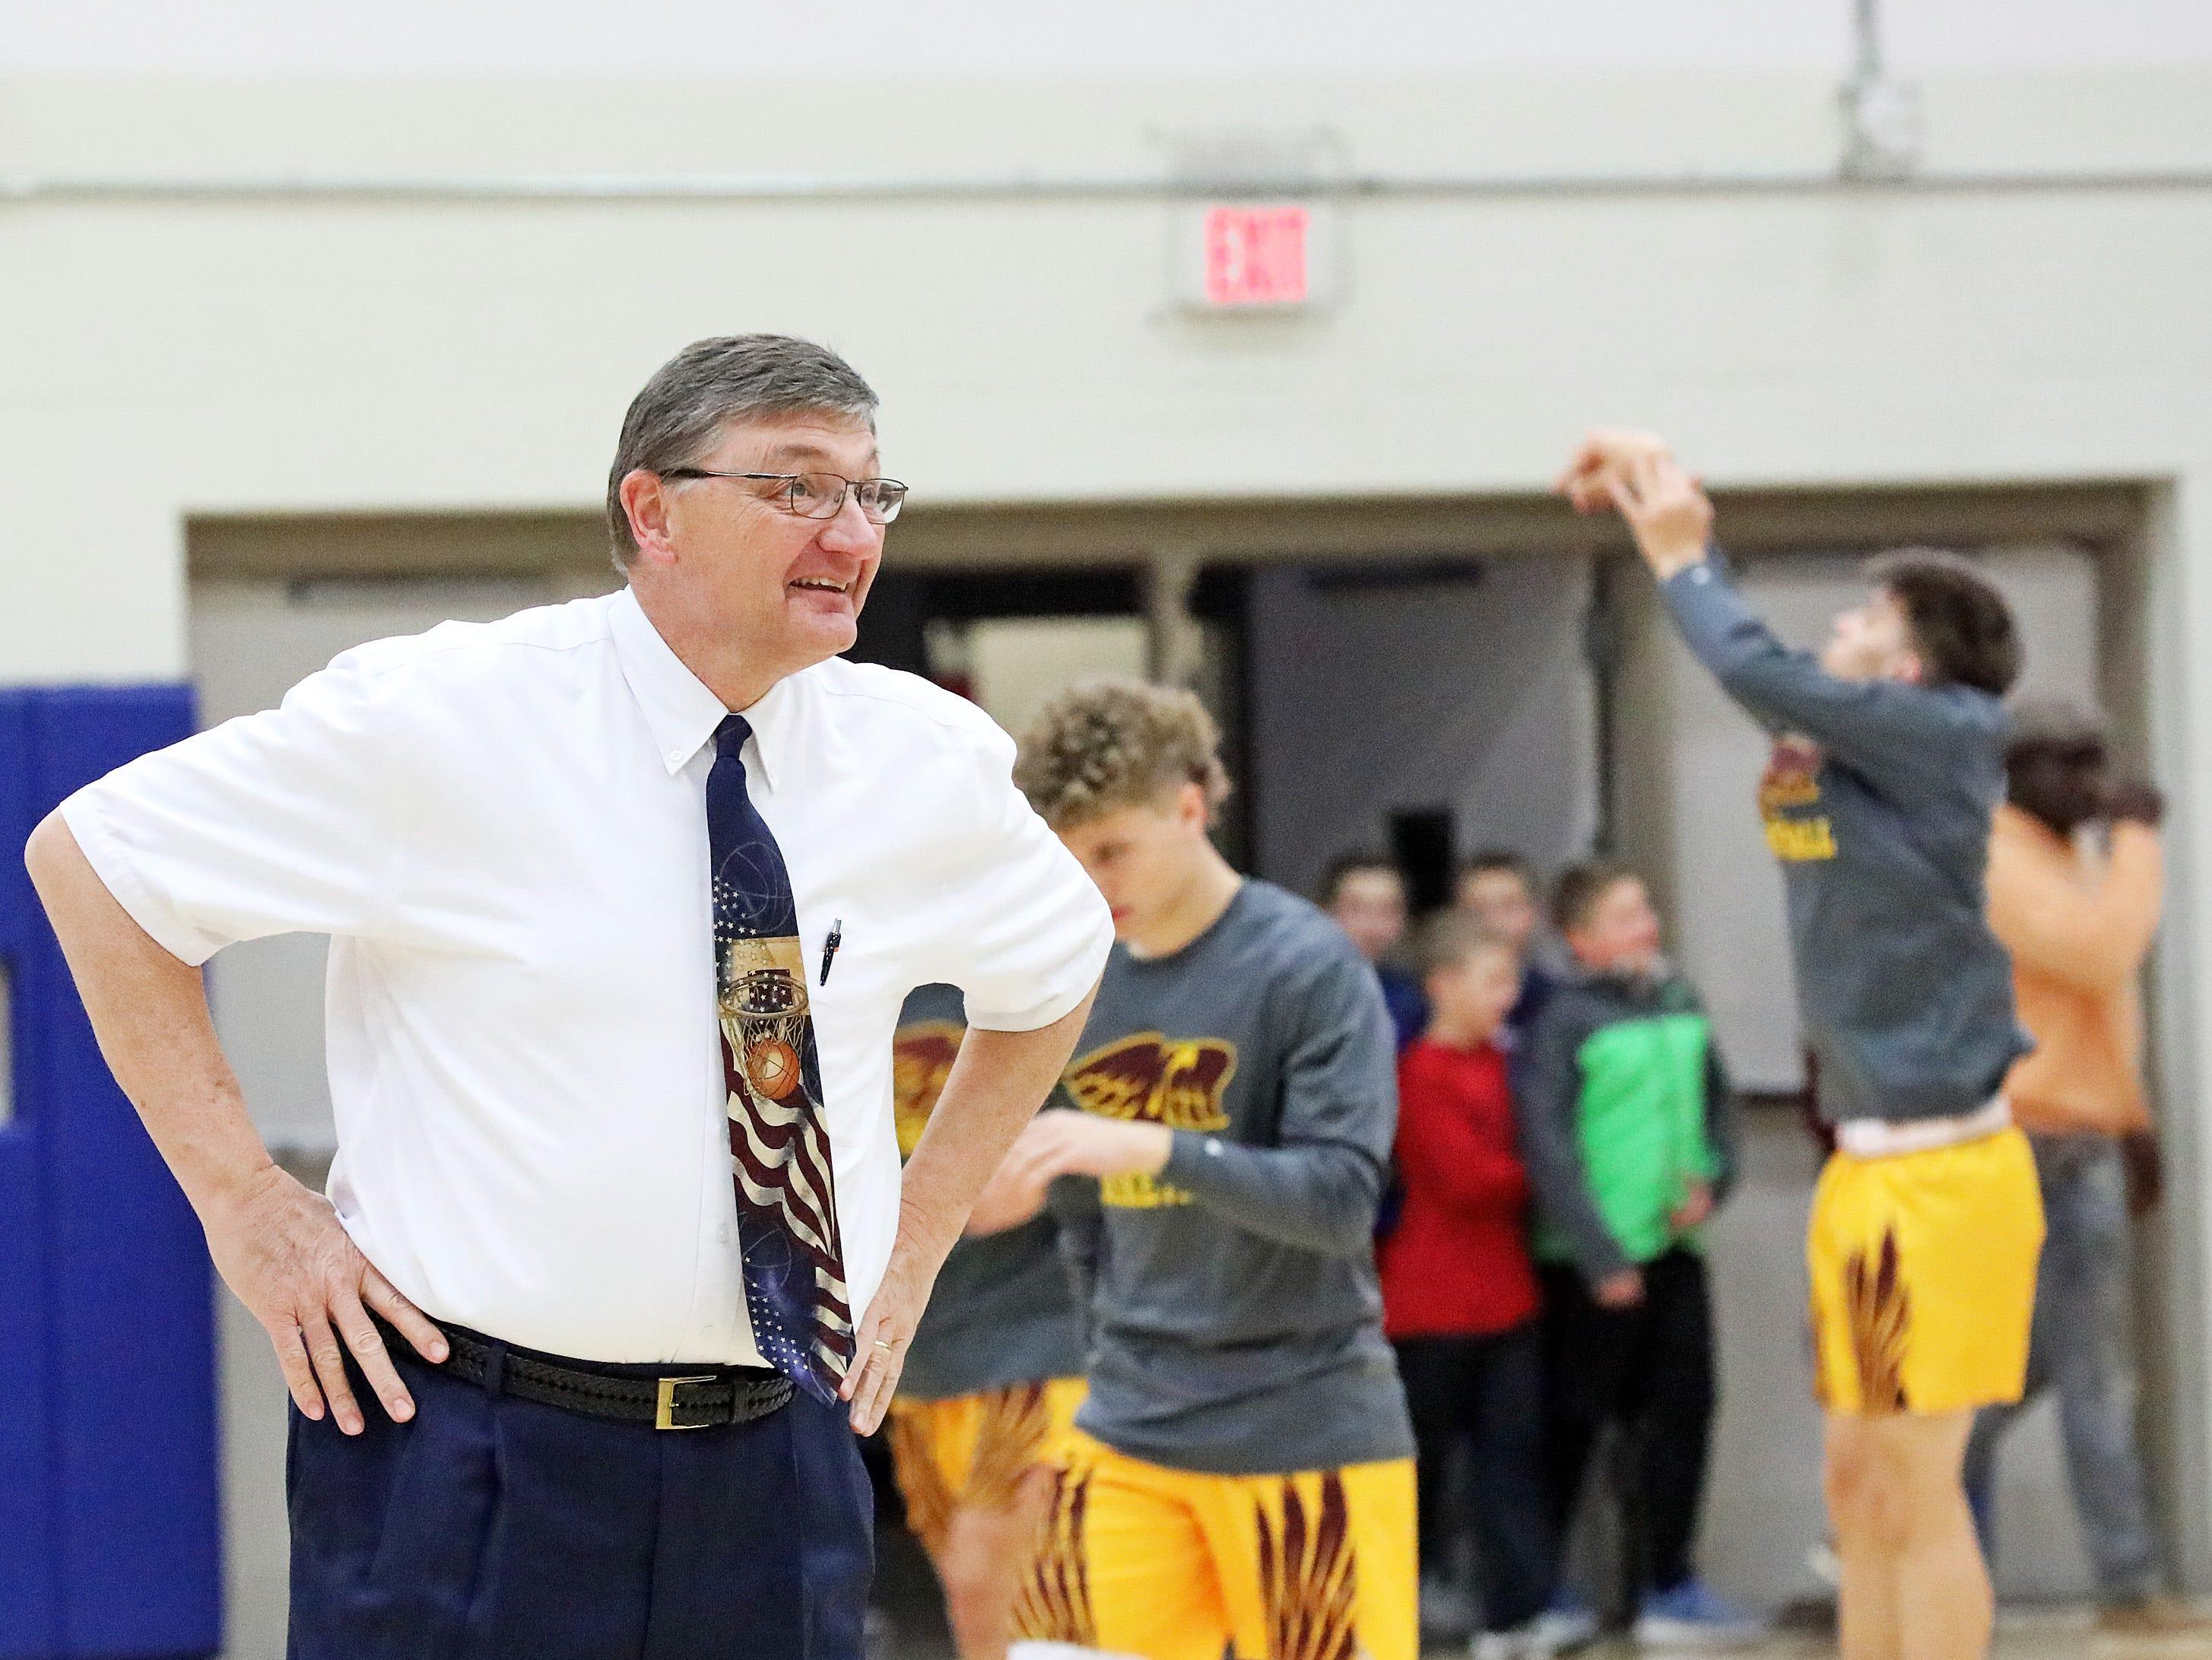 Matt Ellis helps coach the Urbandale boys team as they prepare for the Ankeny Hawks in high school basketball on Friday, Dec. 14, 2018 at Urbandale High School.